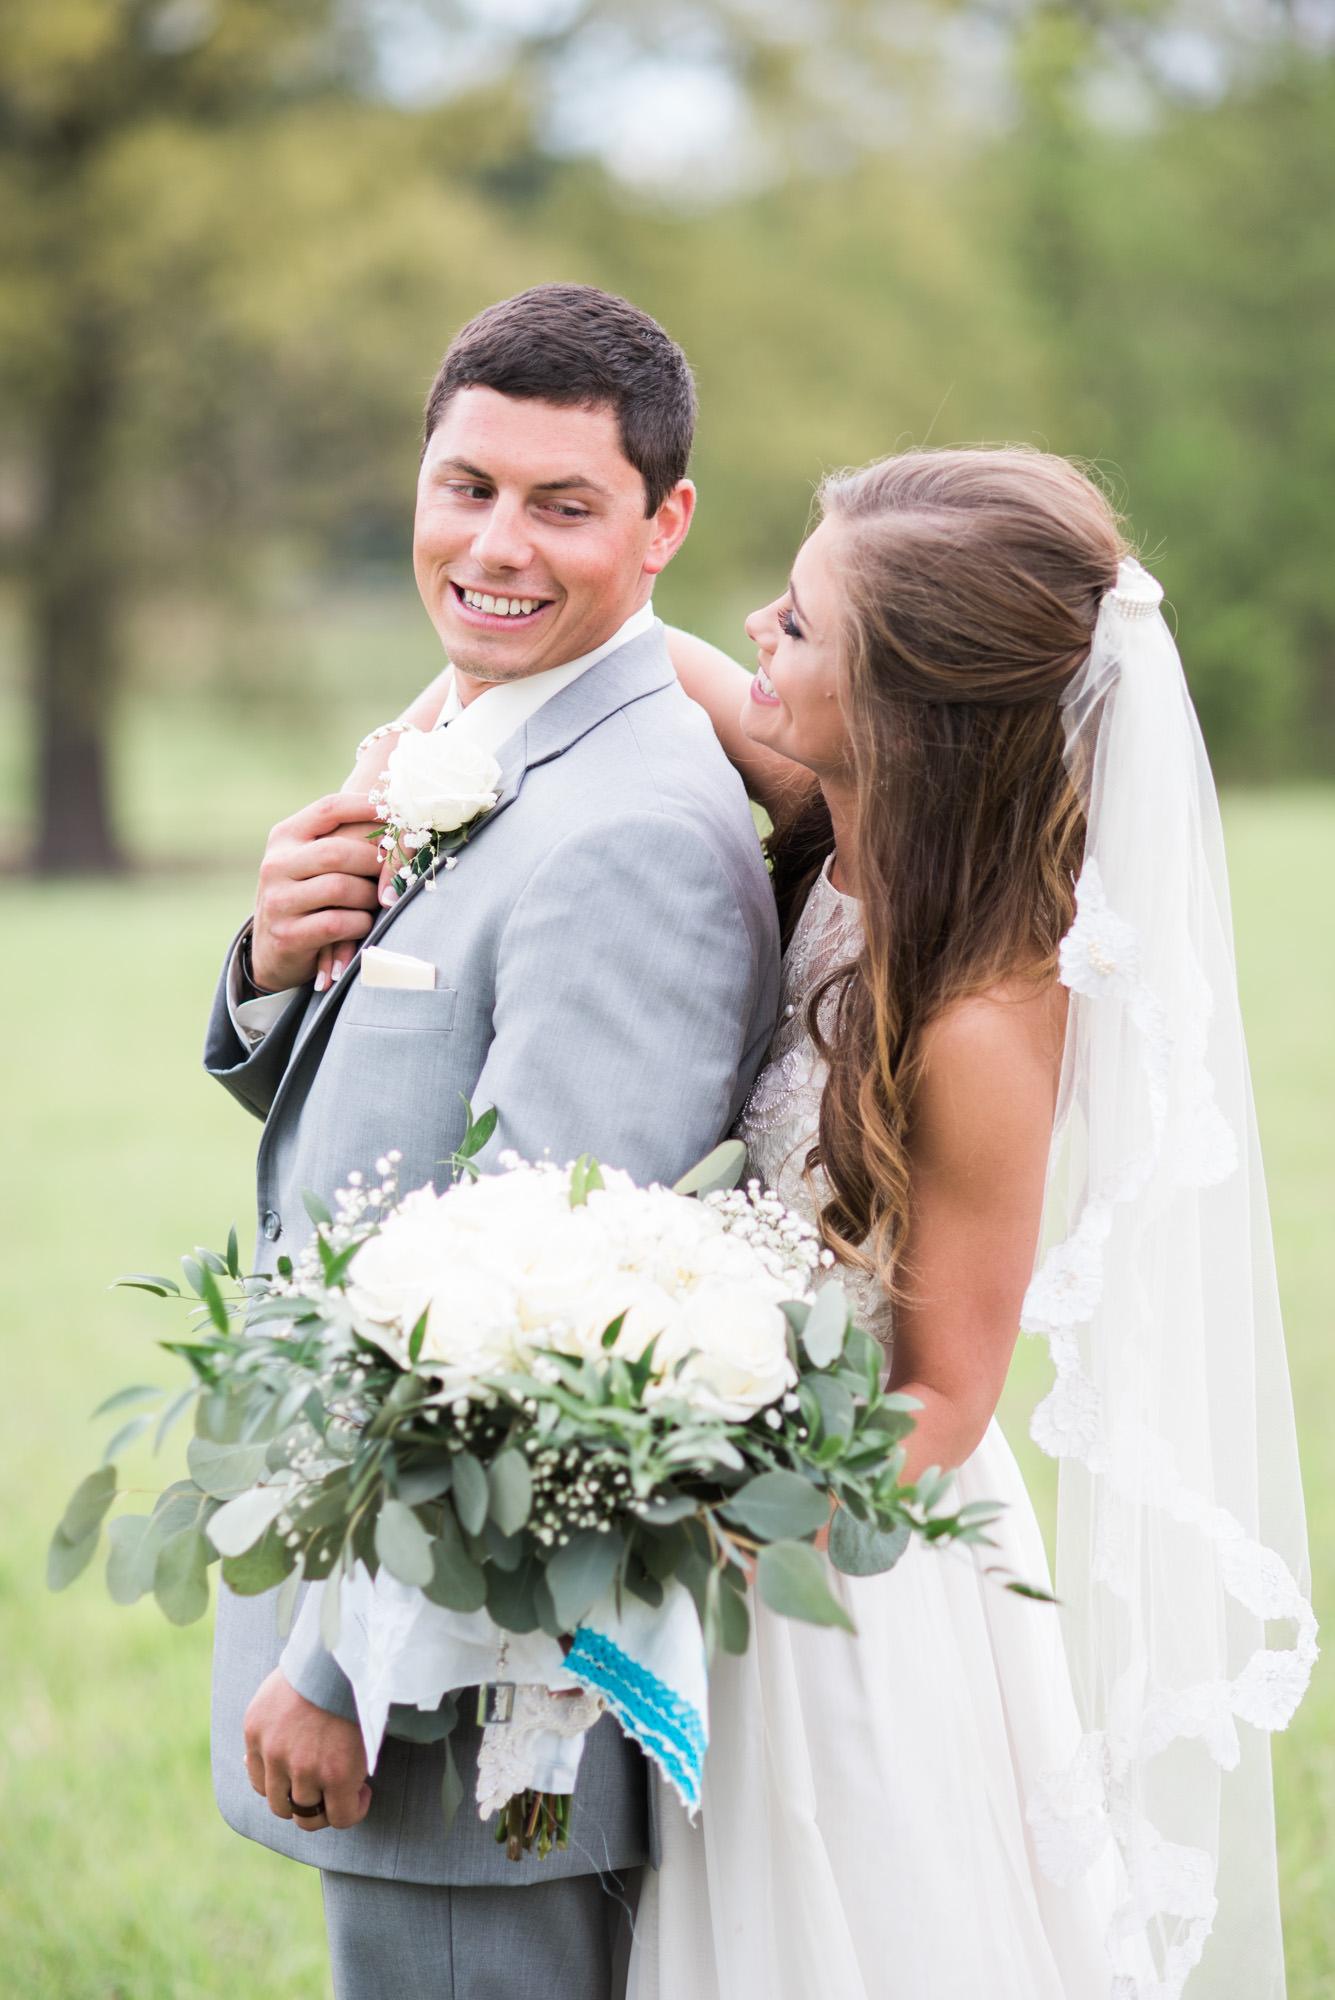 Junebird-Photography-Athens-Wedding-Photographer-45.jpg